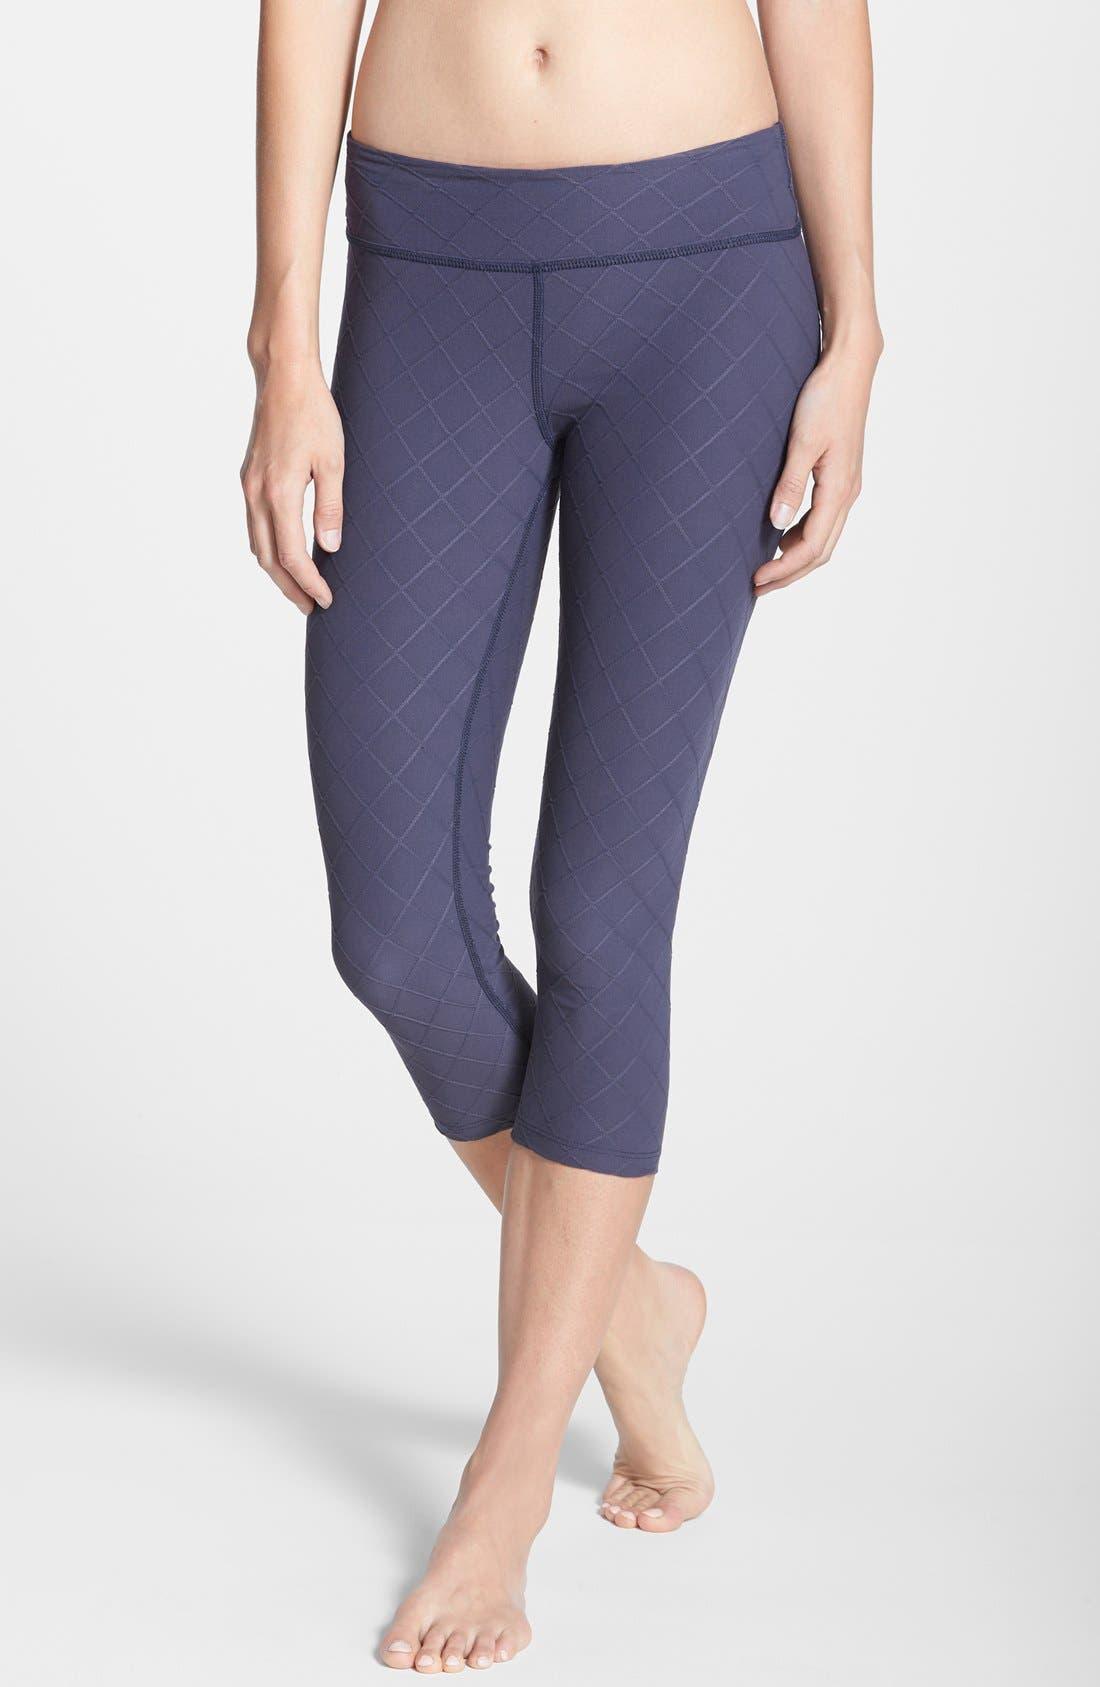 Alternate Image 1 Selected - Beyond Yoga 'Essential' Quilted Capri Leggings